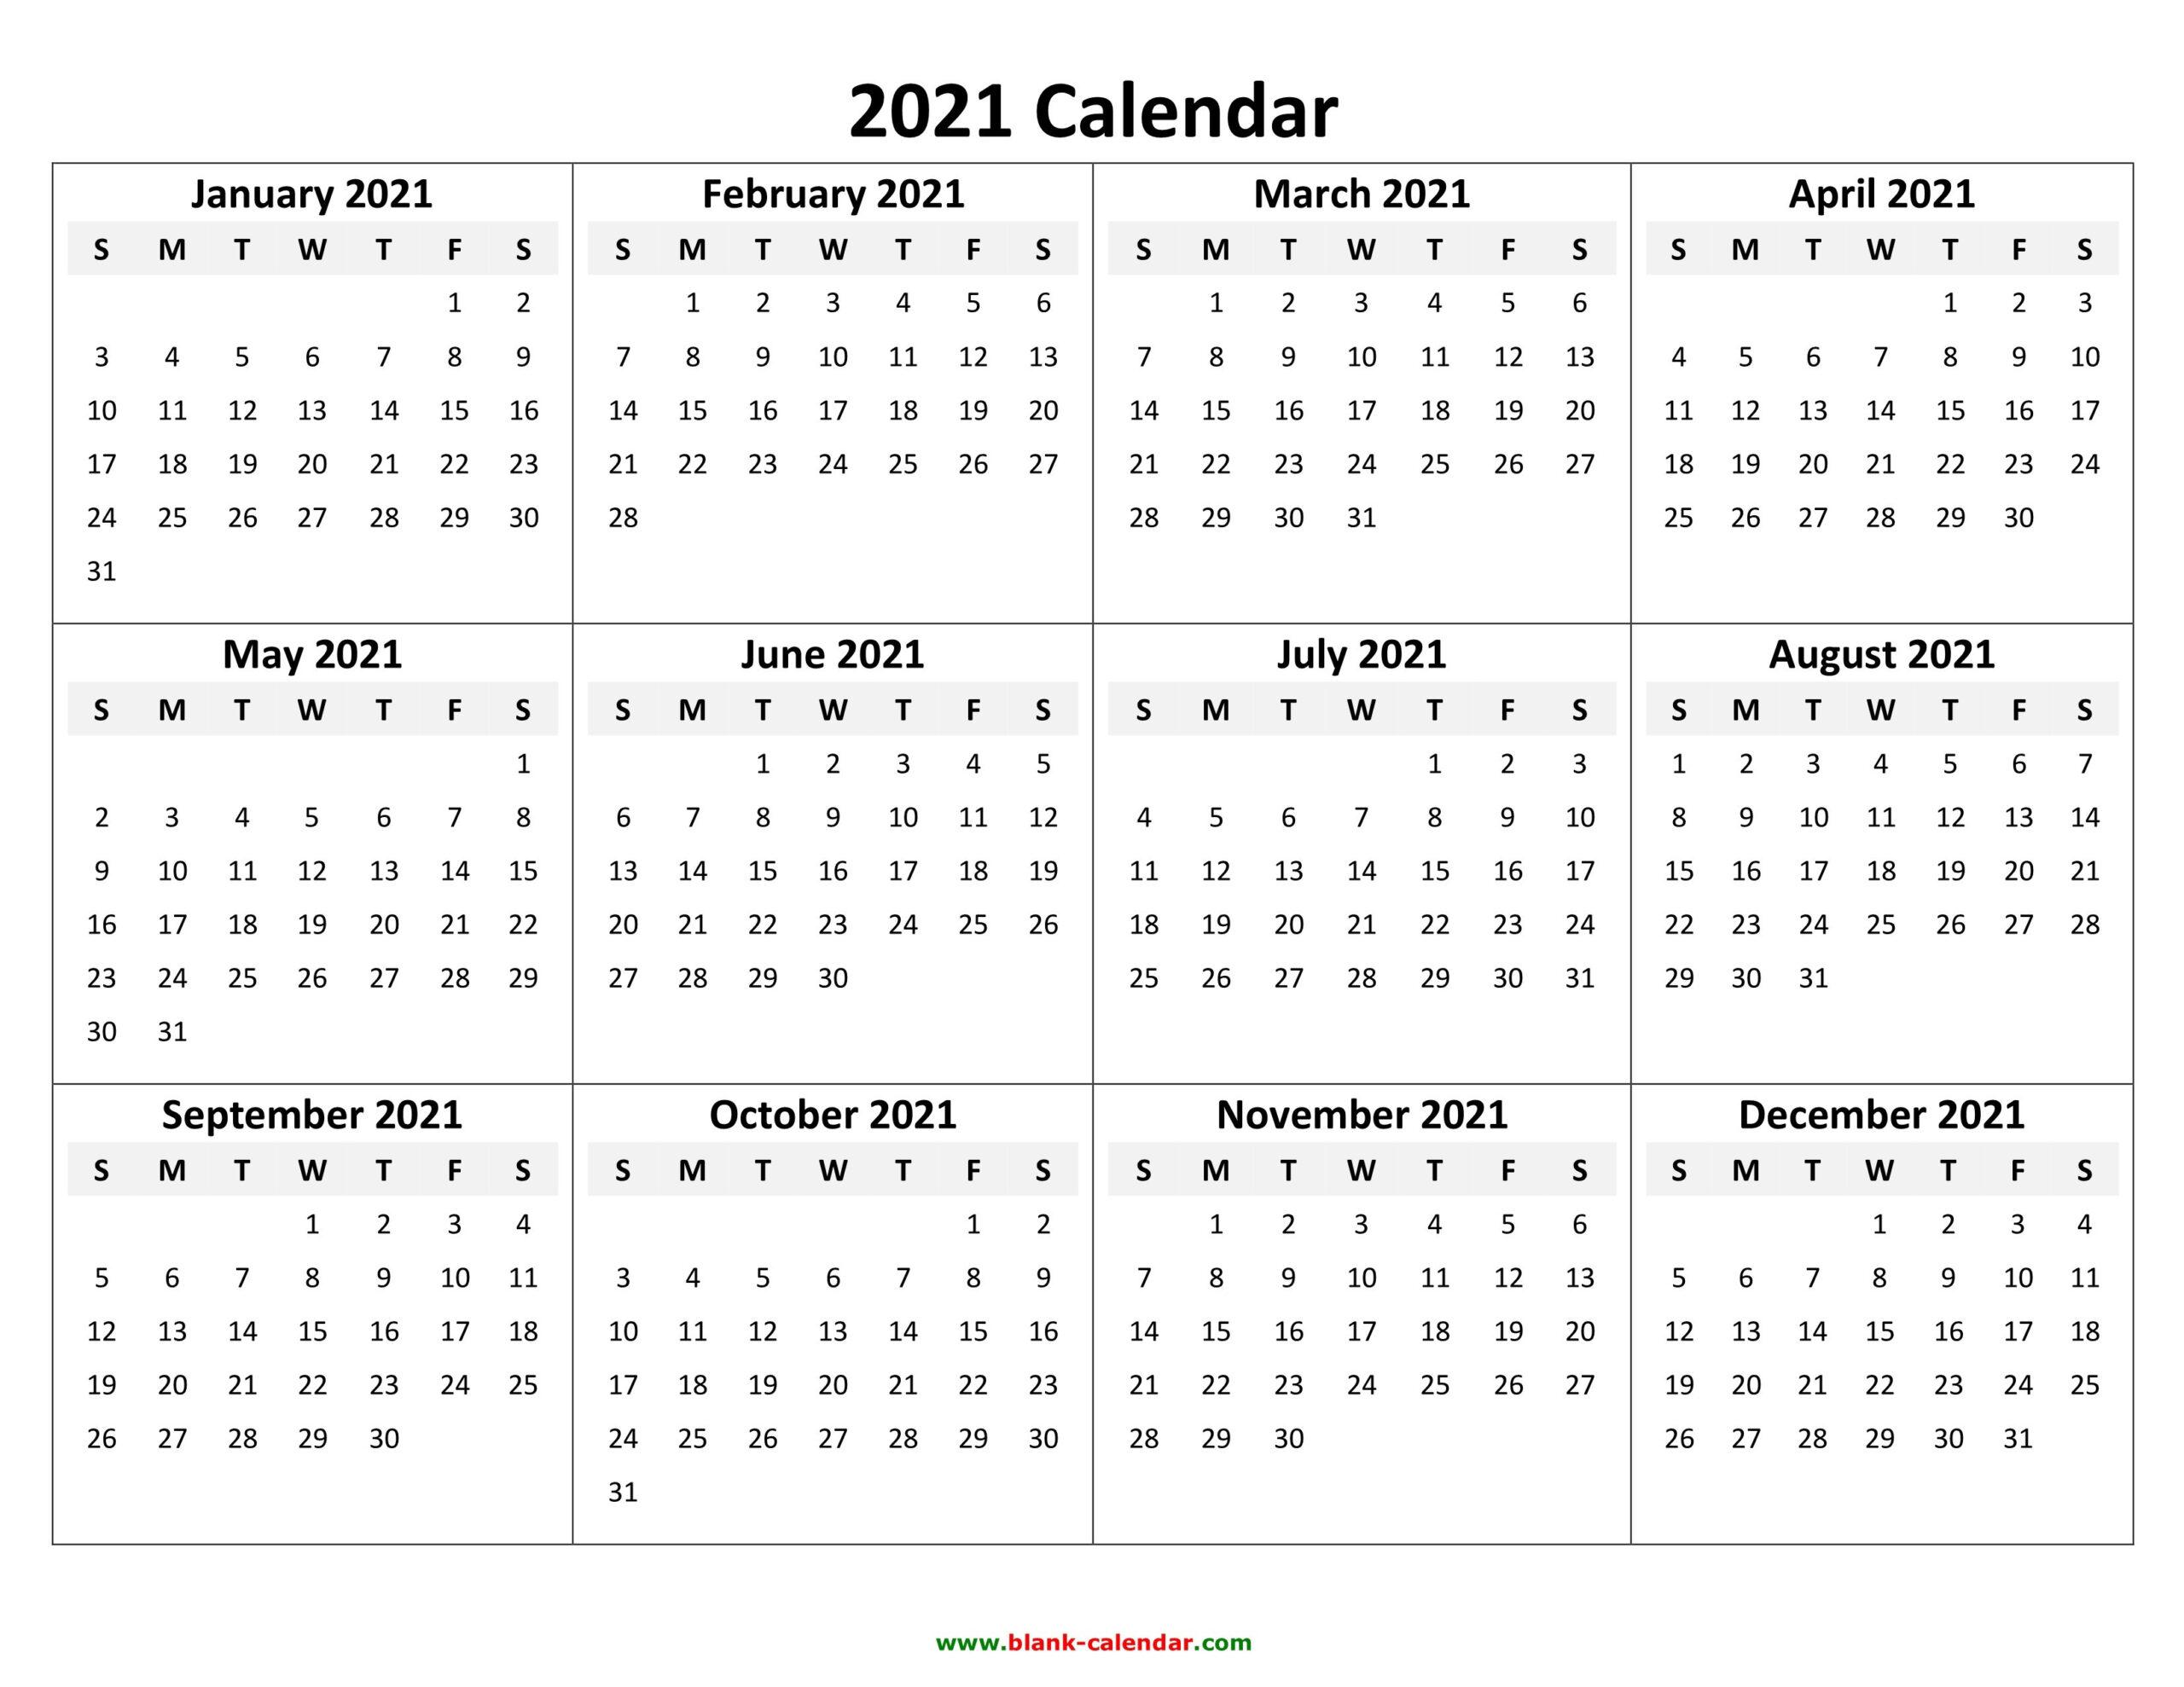 2021 Calendar Pdf 3 Year Calendar Full Page   Free  2021 Printable 3 Monthly Per Page Calendar